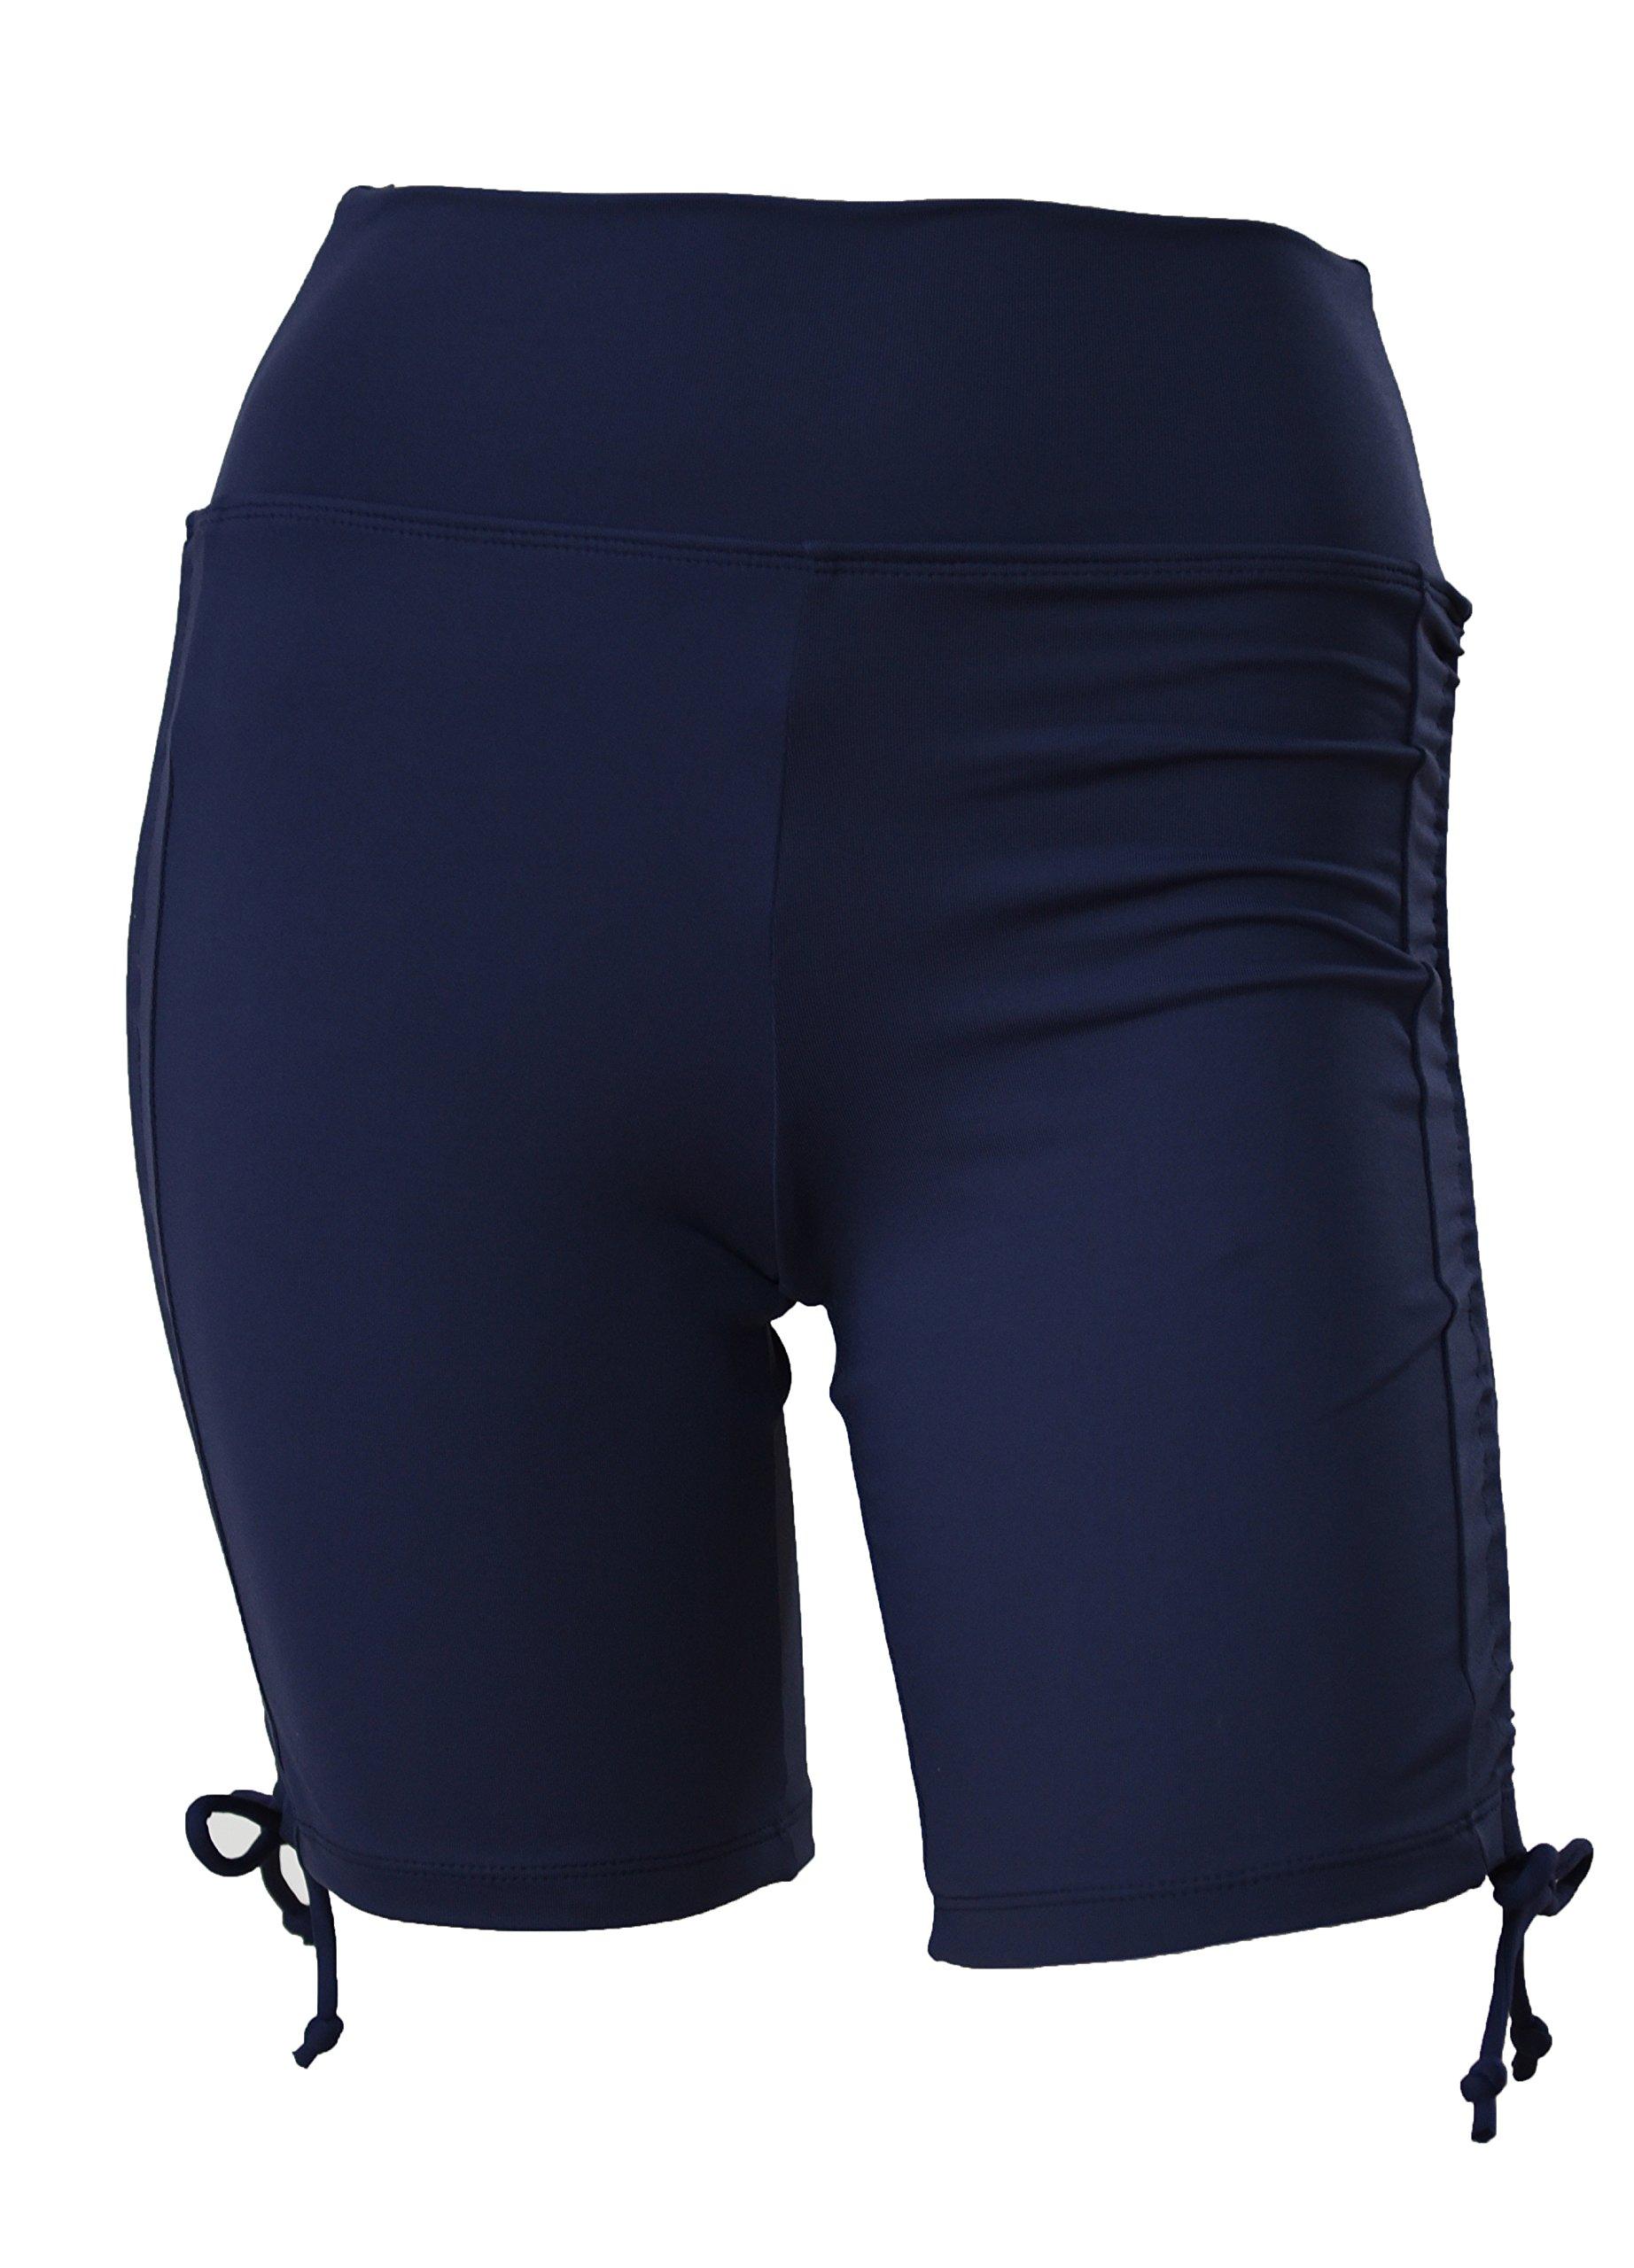 Private Island Women UV Swim Rash Guard Board Shorts Pants Yoga (XS, Navy) by Private Island